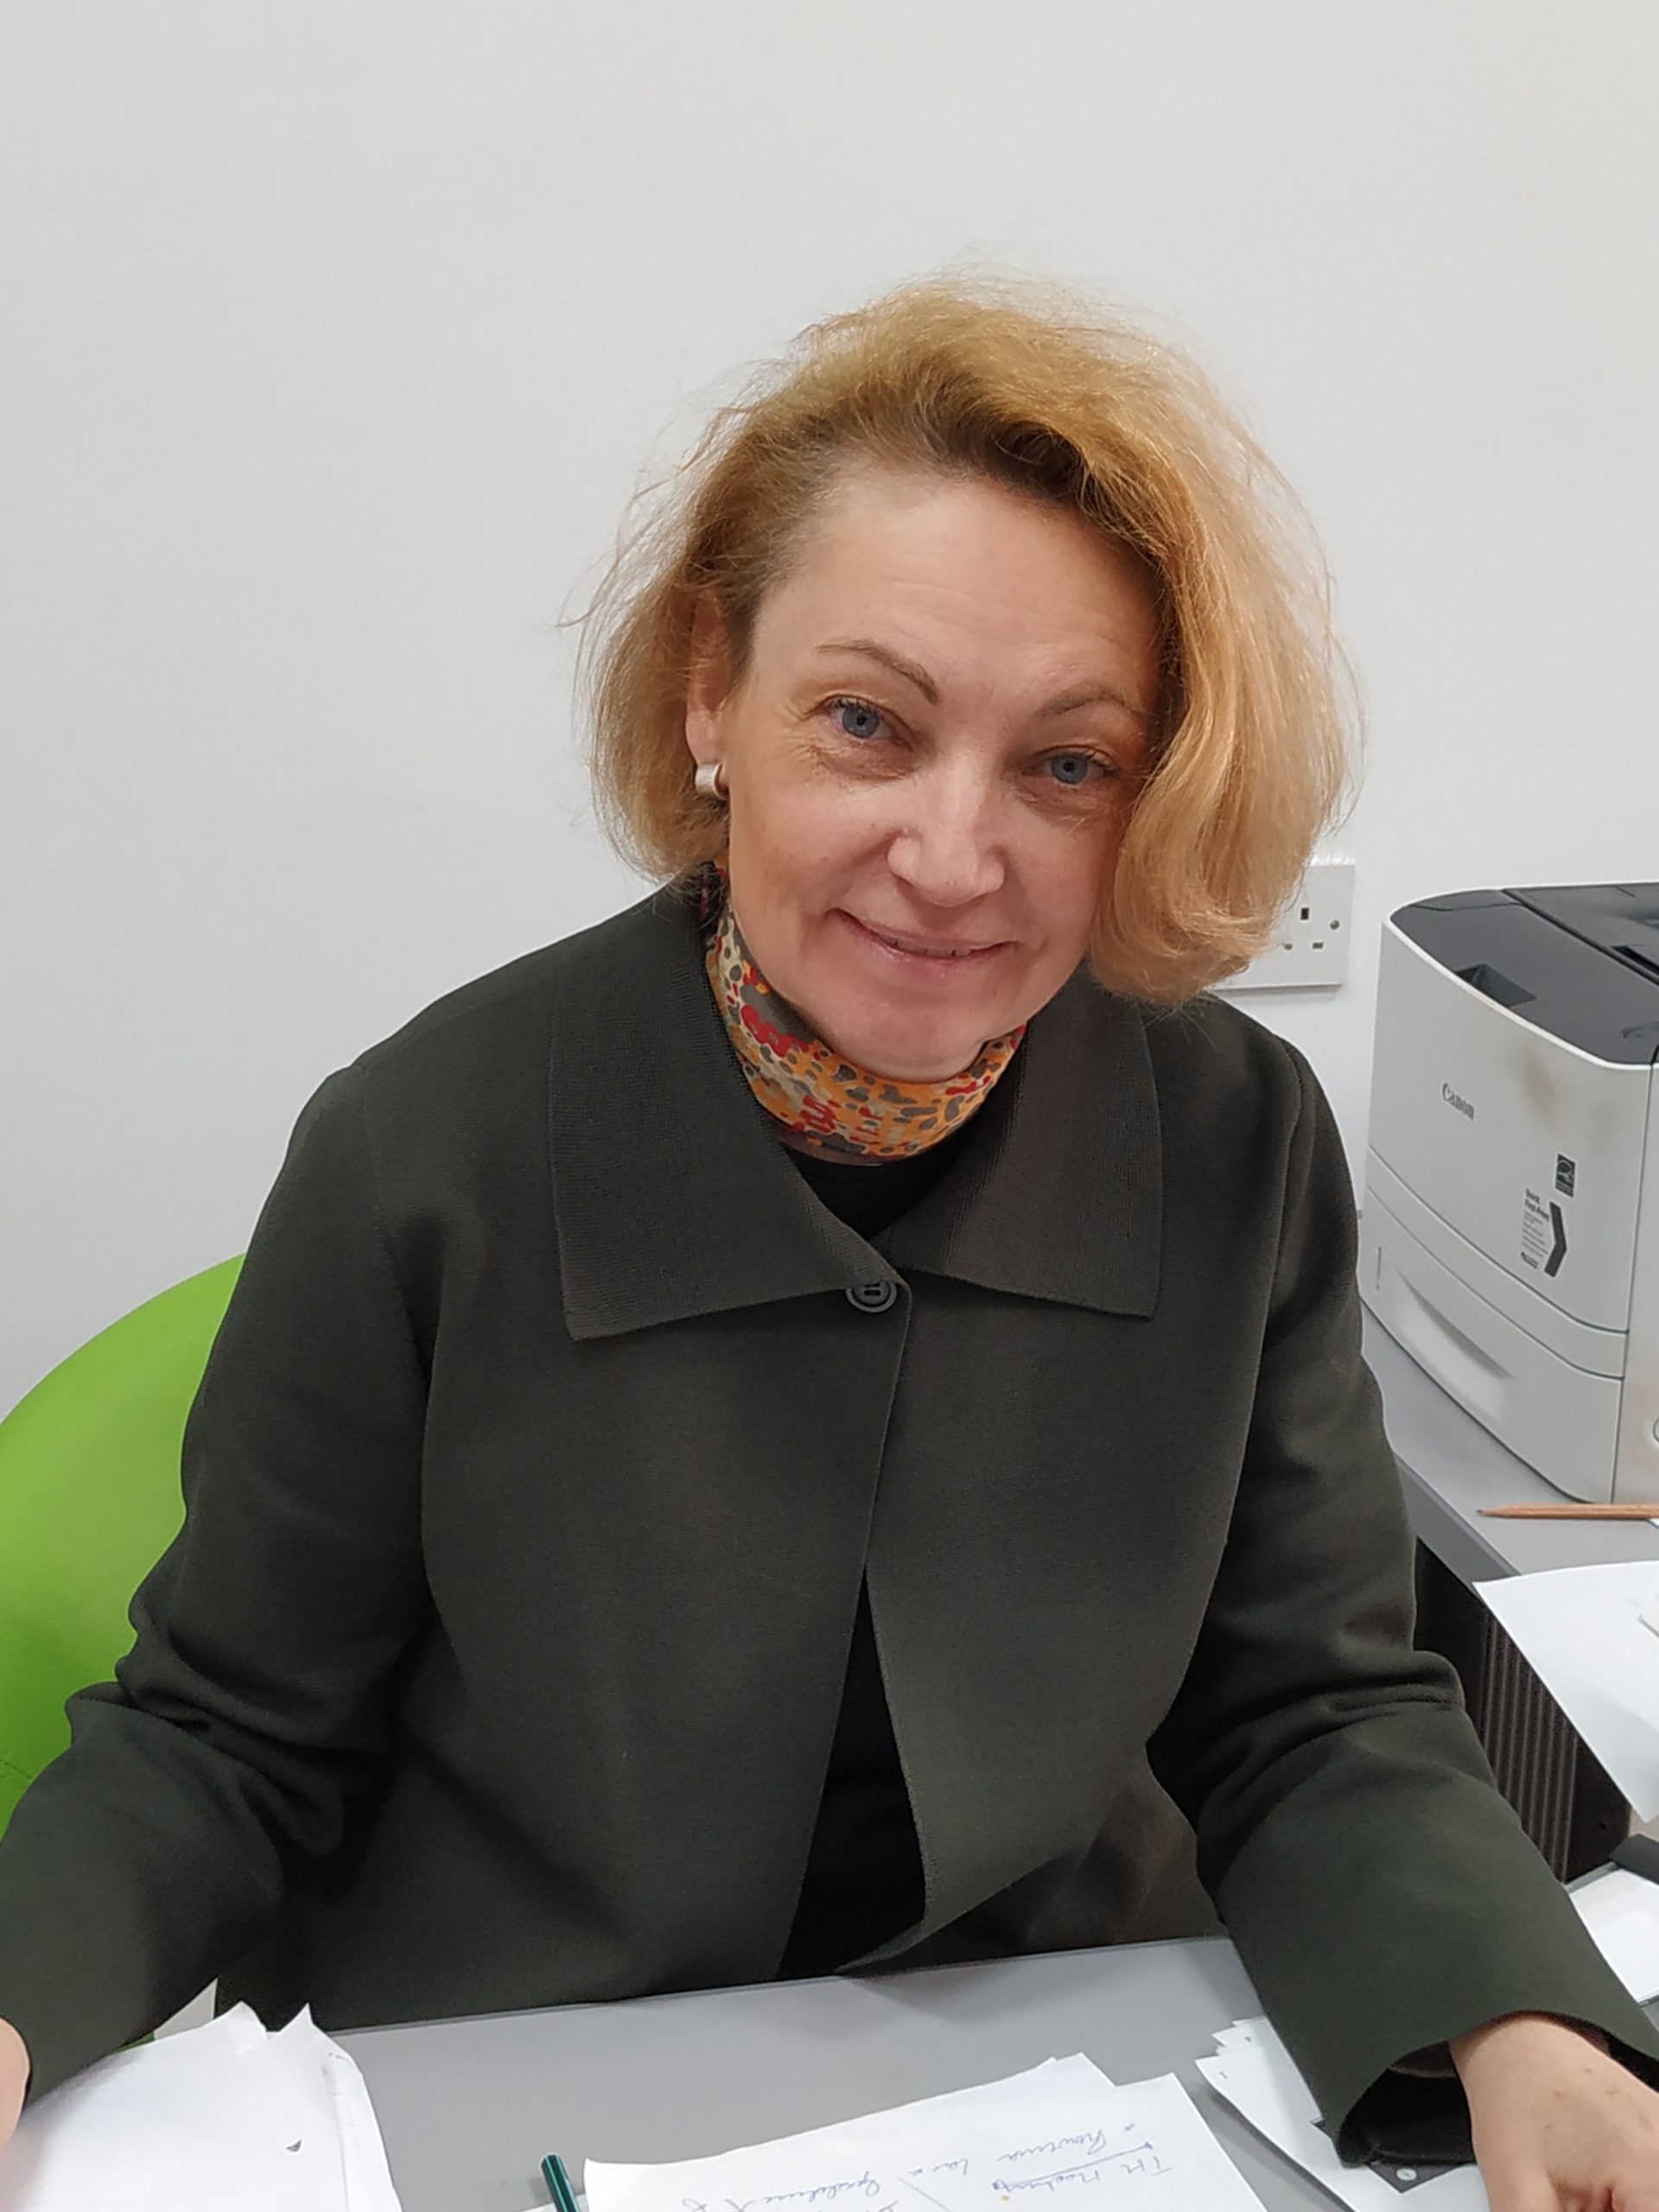 Ms Karin Grech M.A.